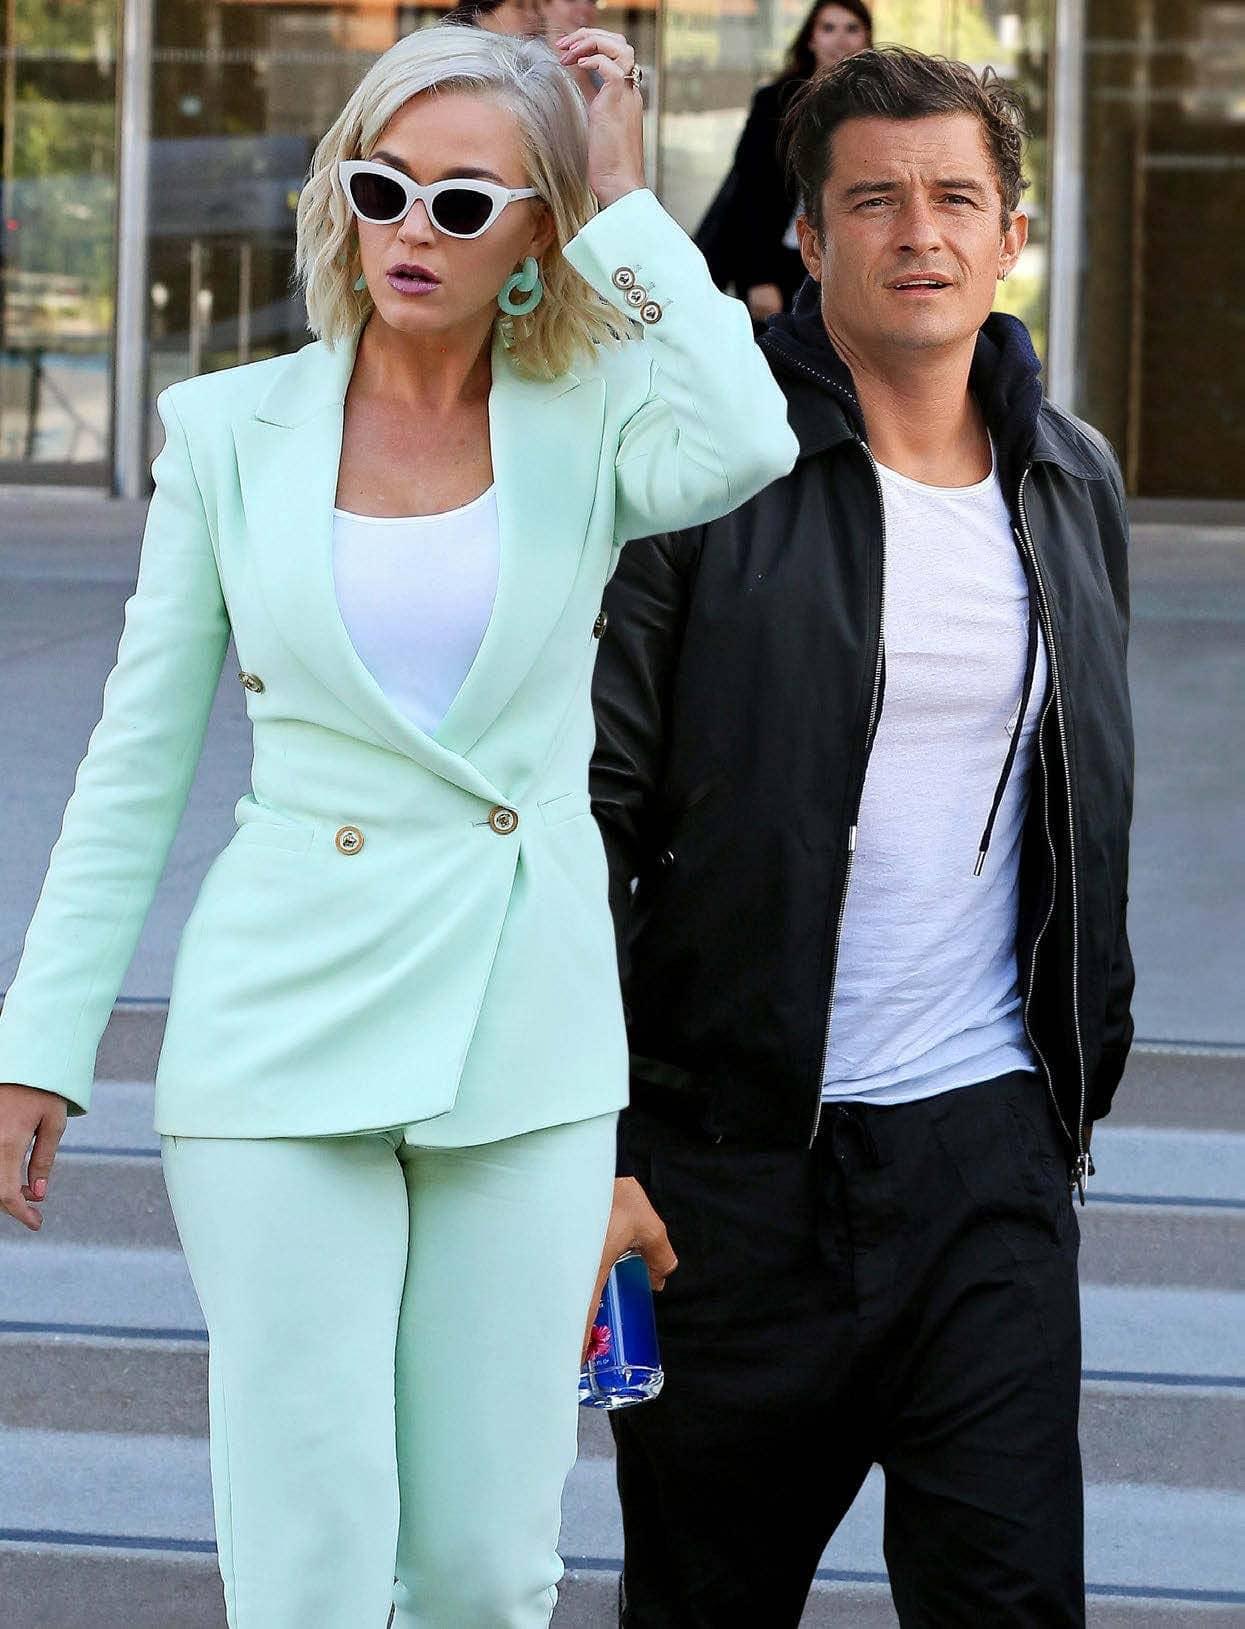 Katy & Orlando The Wedding Is Off